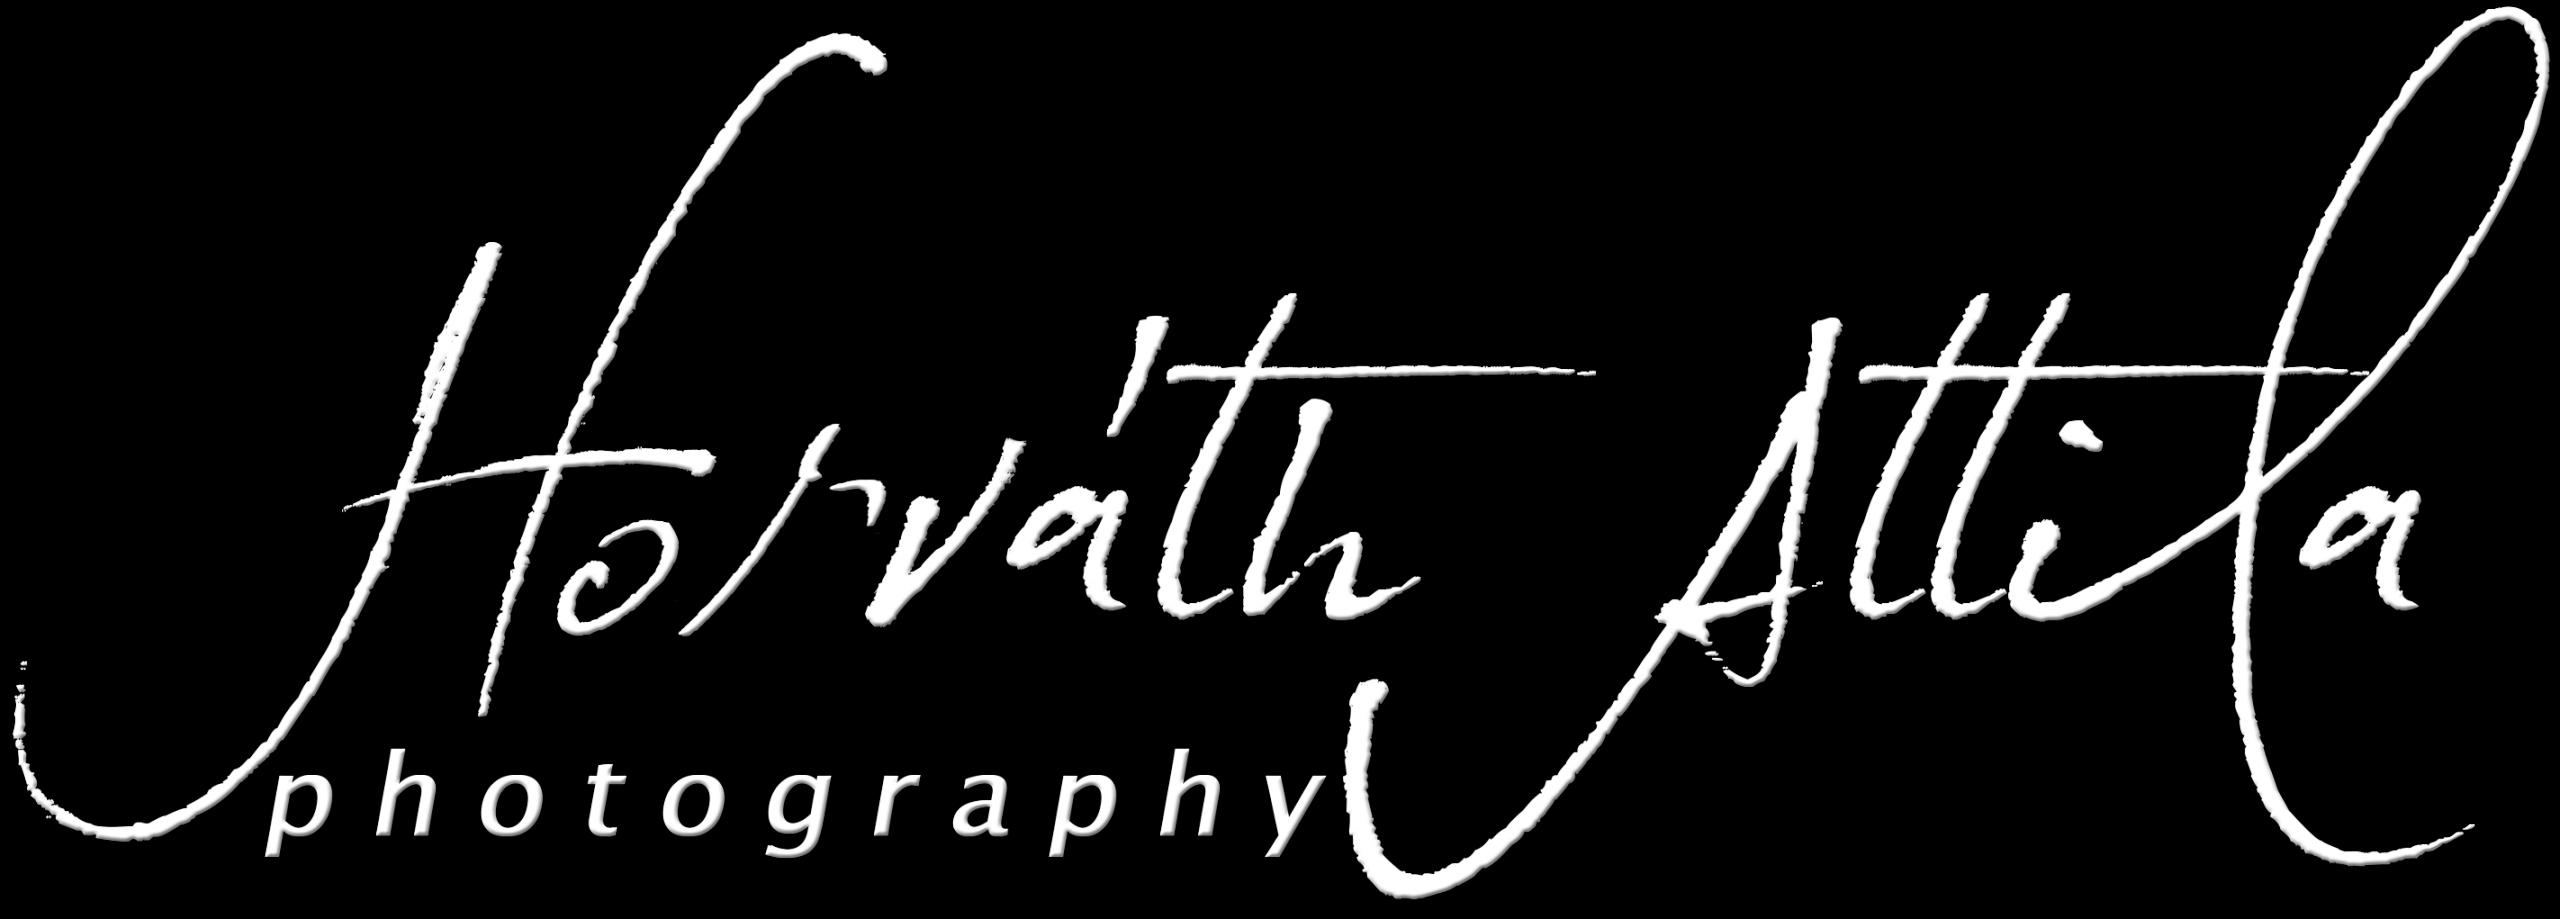 Horvath Attila Photography